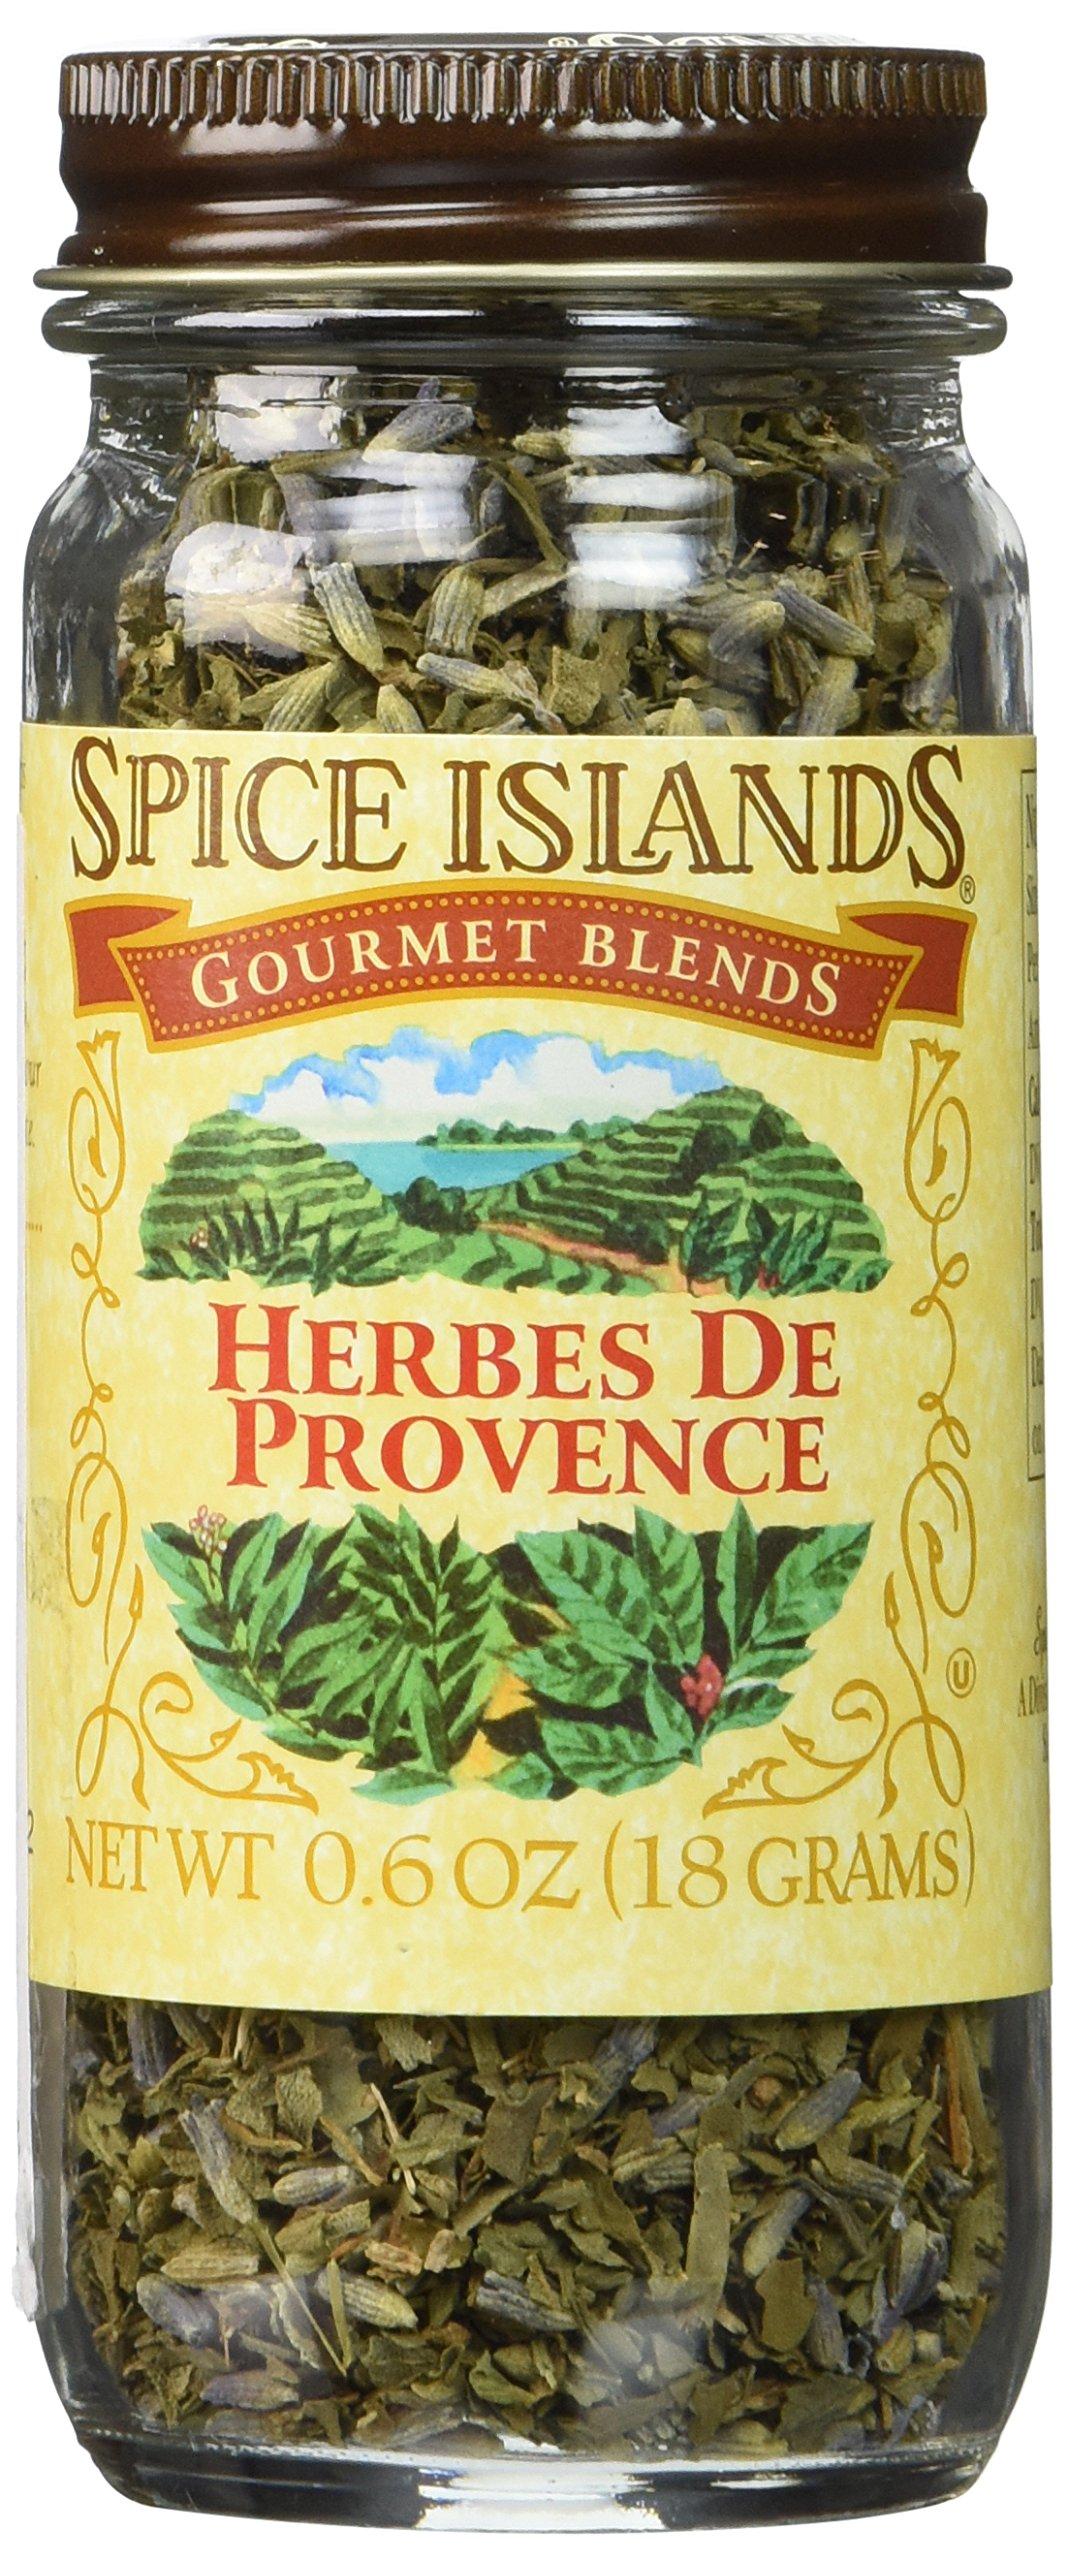 Spice Islands Herbes De Provence .6-oz. shaker